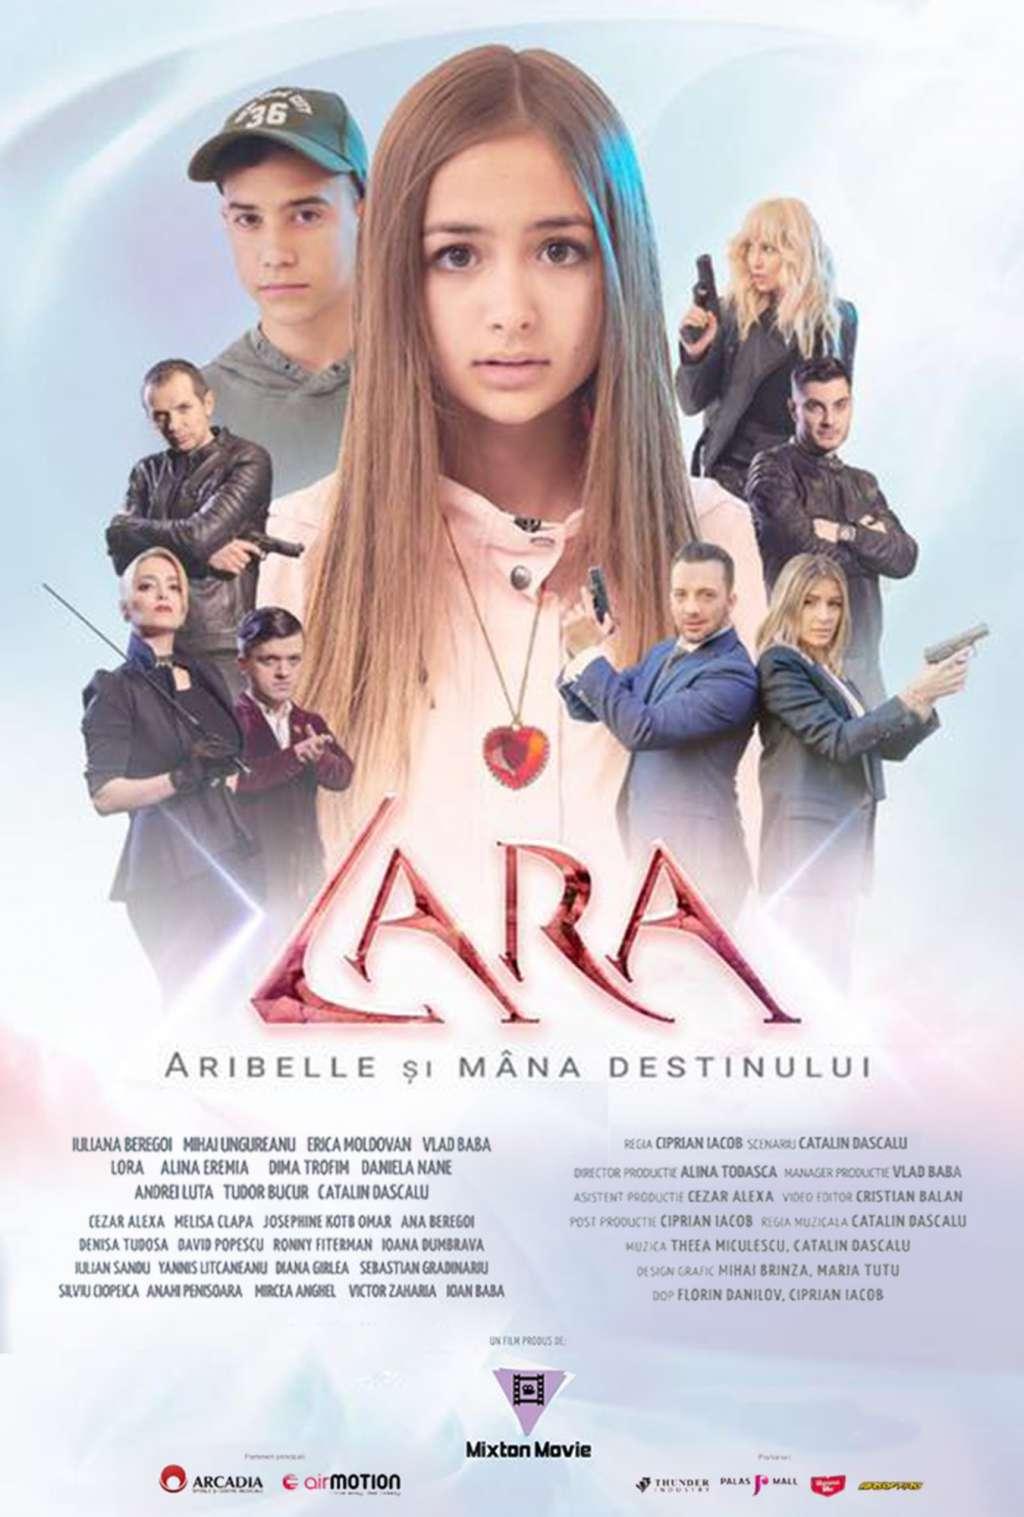 Lara - Aribelle si mana destinului kapak